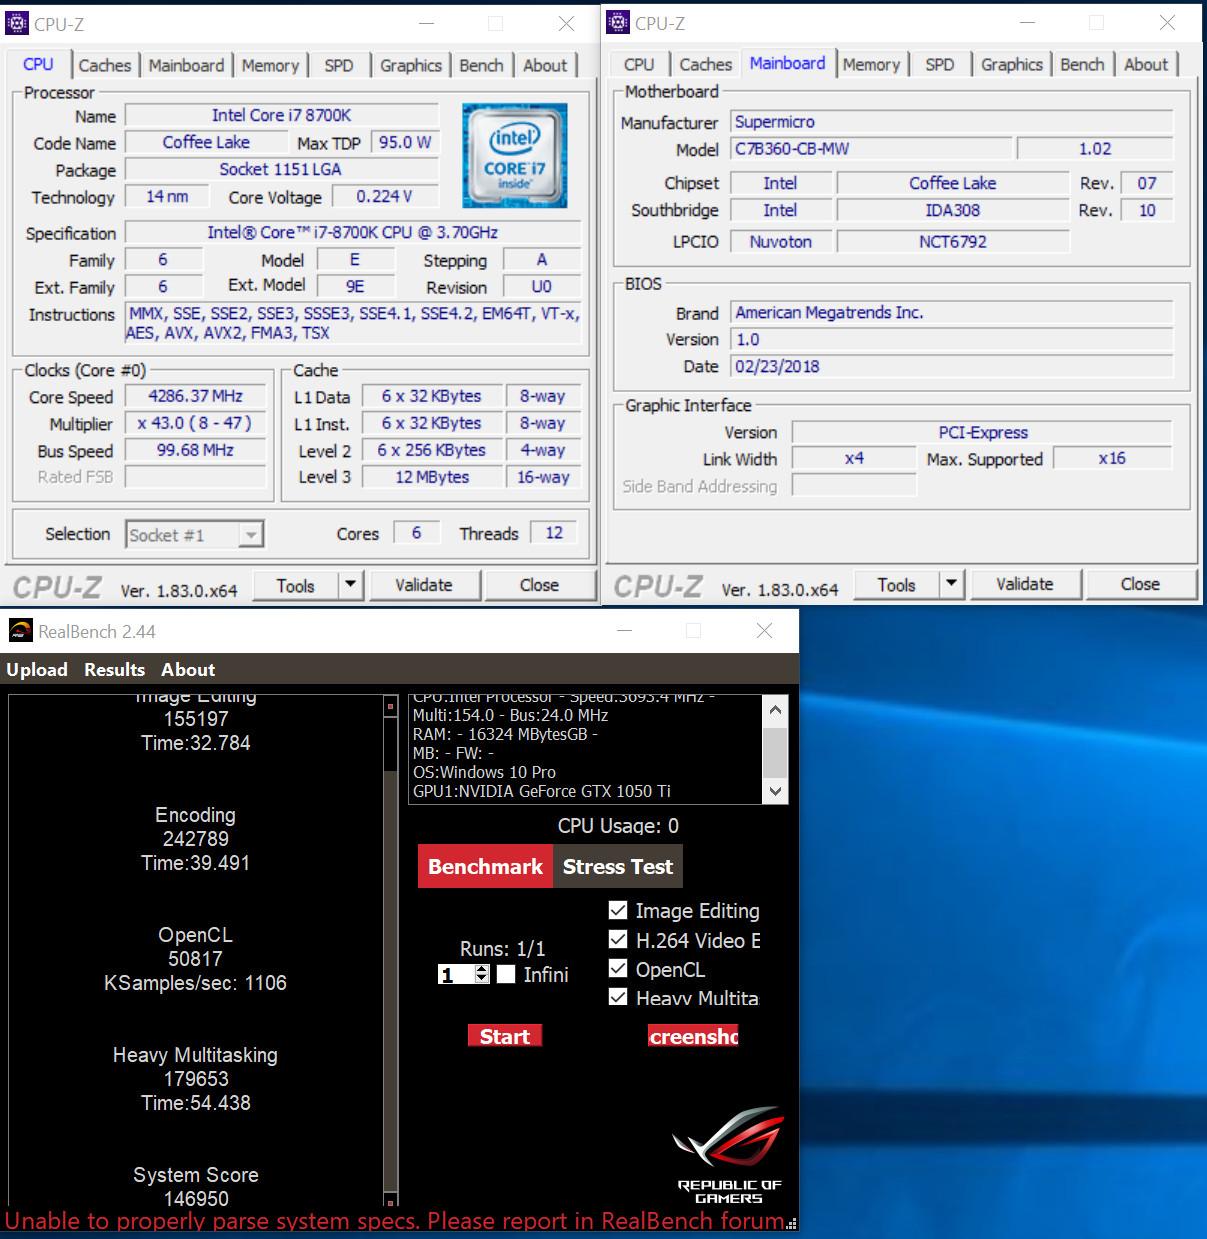 SuperO_C7B360-CB-MW_-61